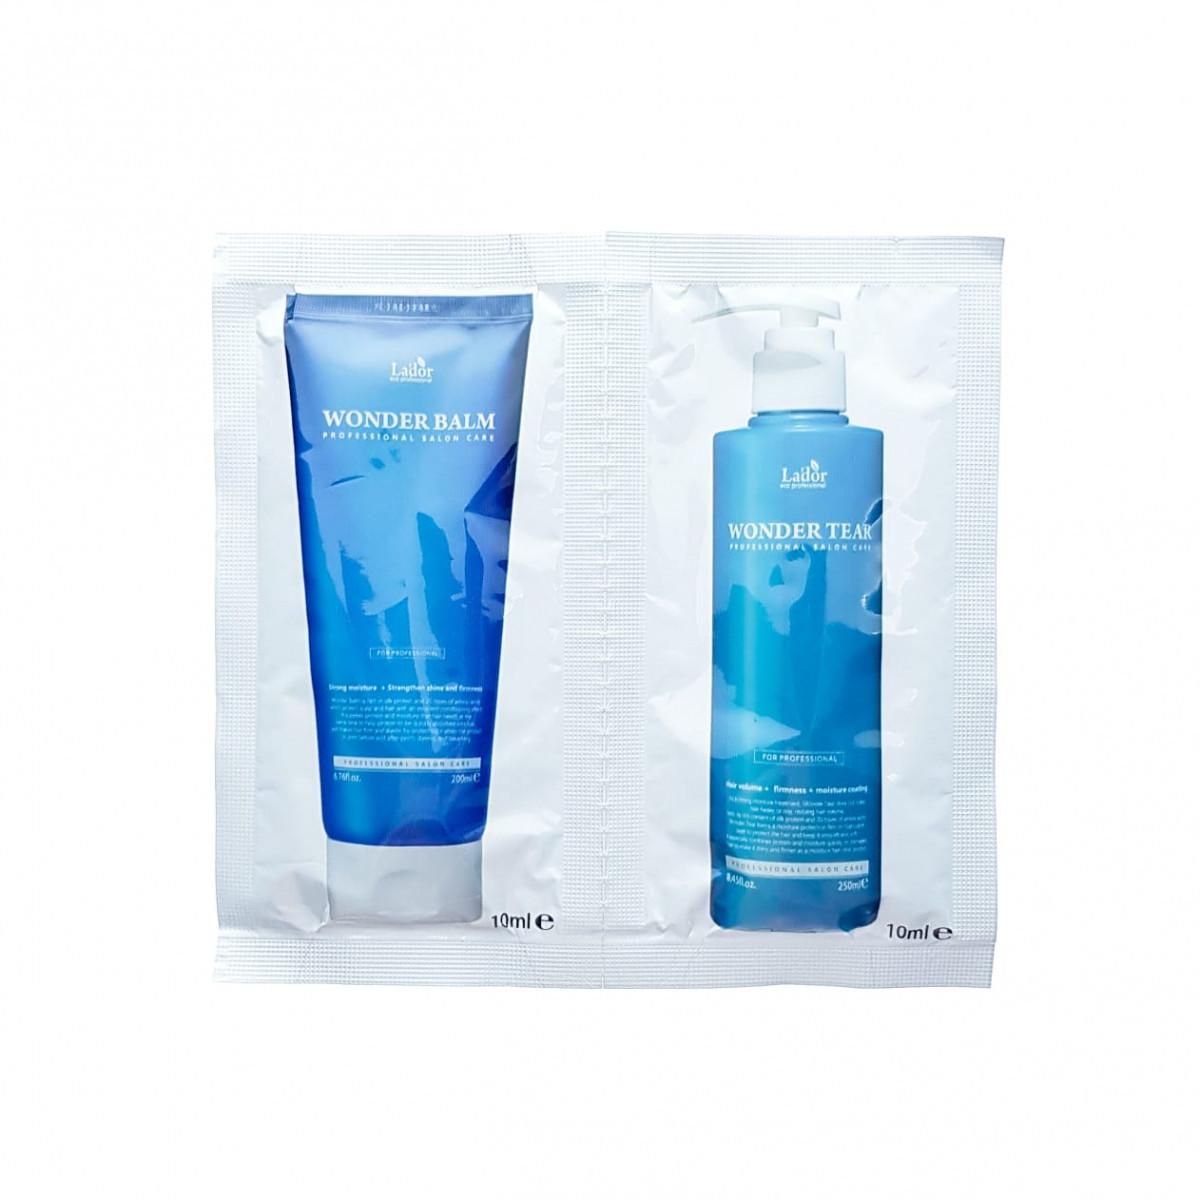 Двухшаговый уход за волосами (набор из бальзама и маски) La'dor Wonder Clinic Pouch Set 10 мл + 10 мл (8809181937950)